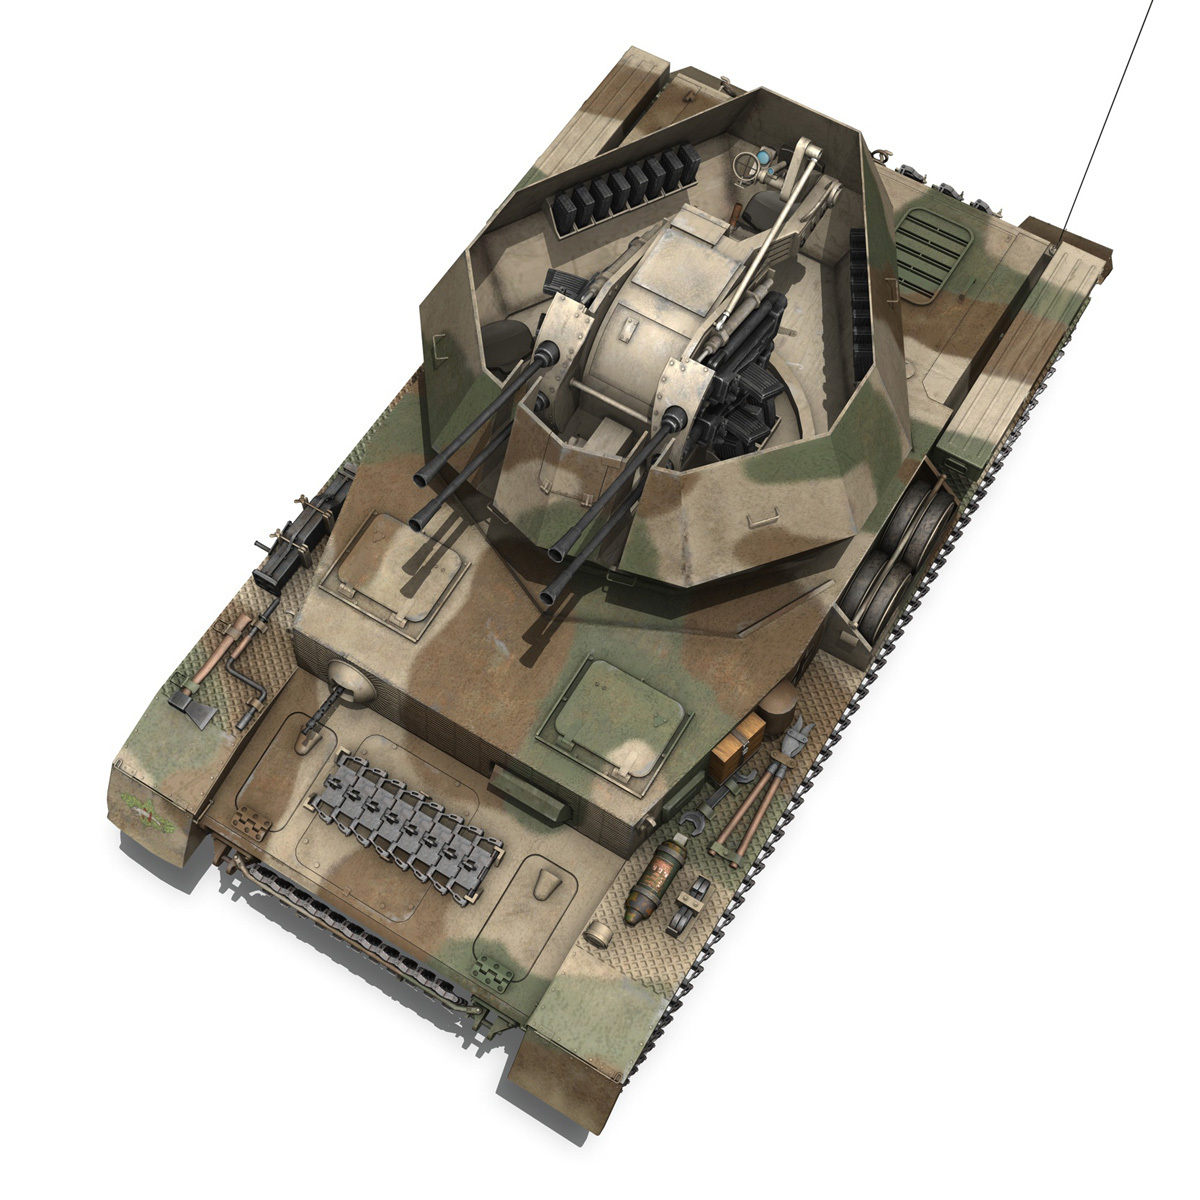 flakpanzer iv – wirbelwind – spzjgabt 654 3d model 3ds fbx c4d lwo obj 282313